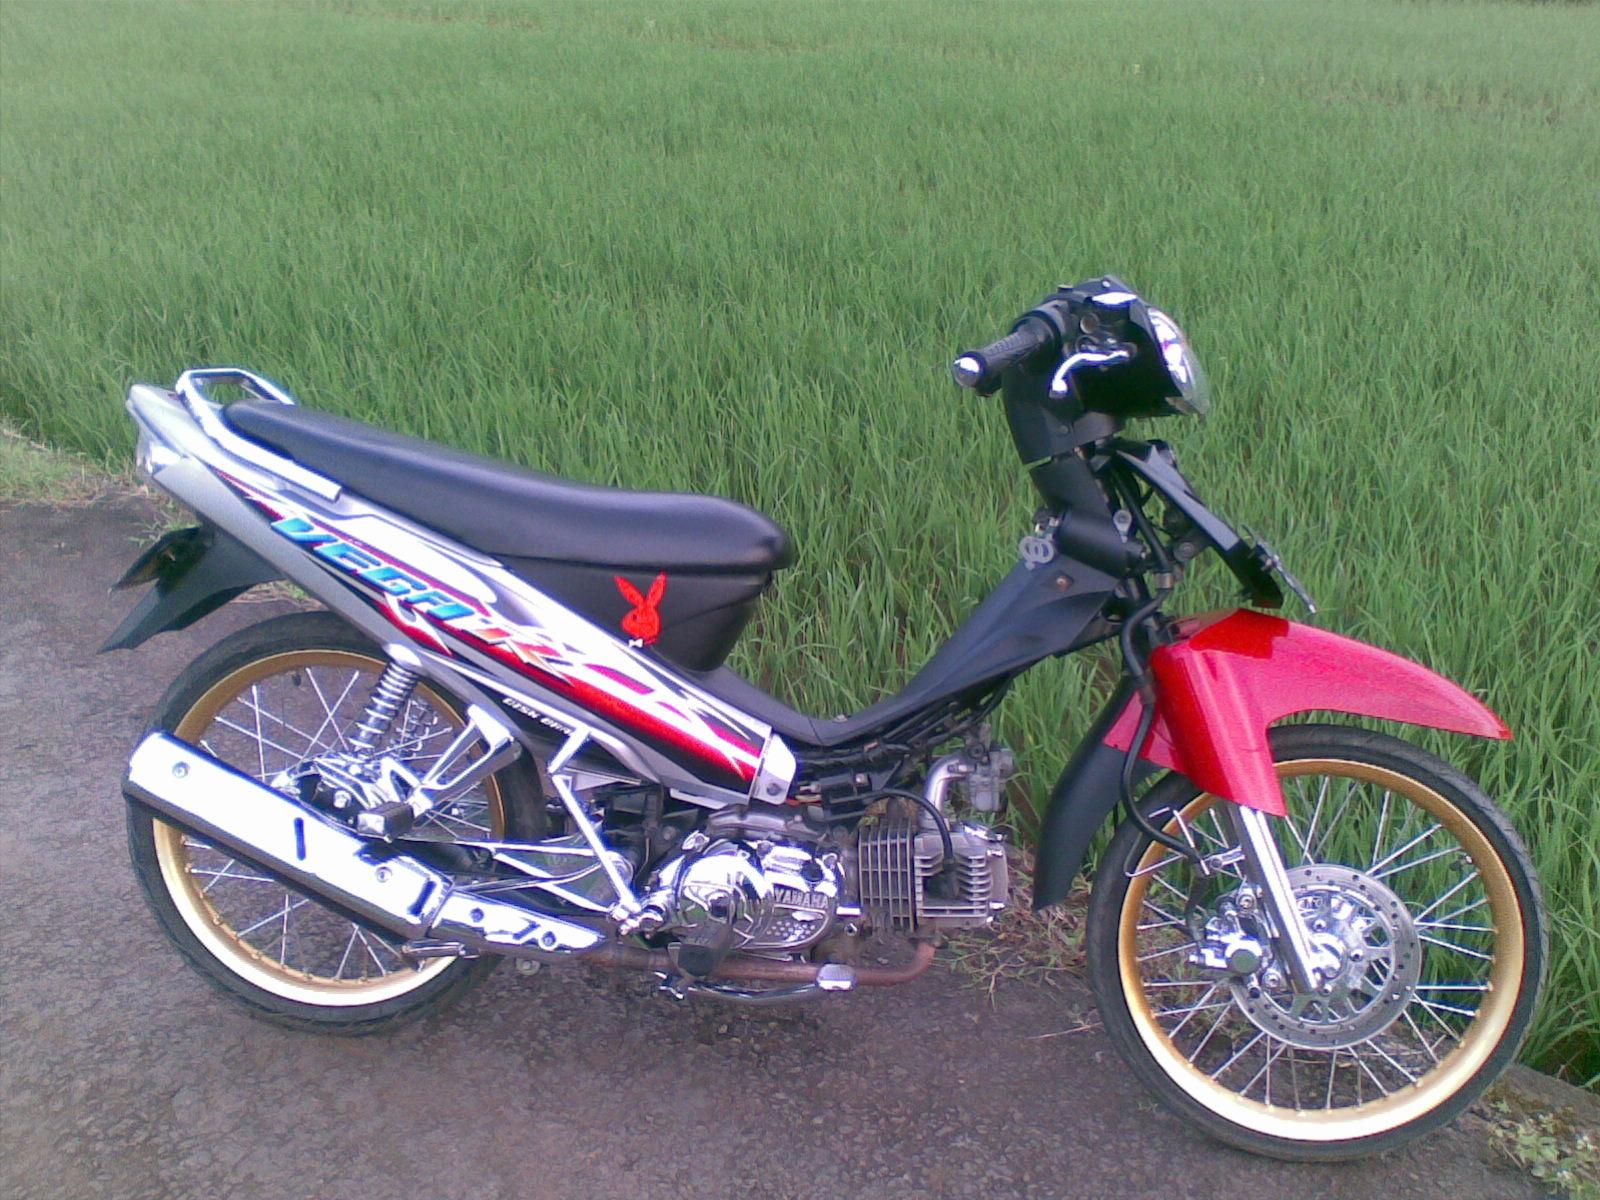 Modif Motor Yamaha Vega R 2005